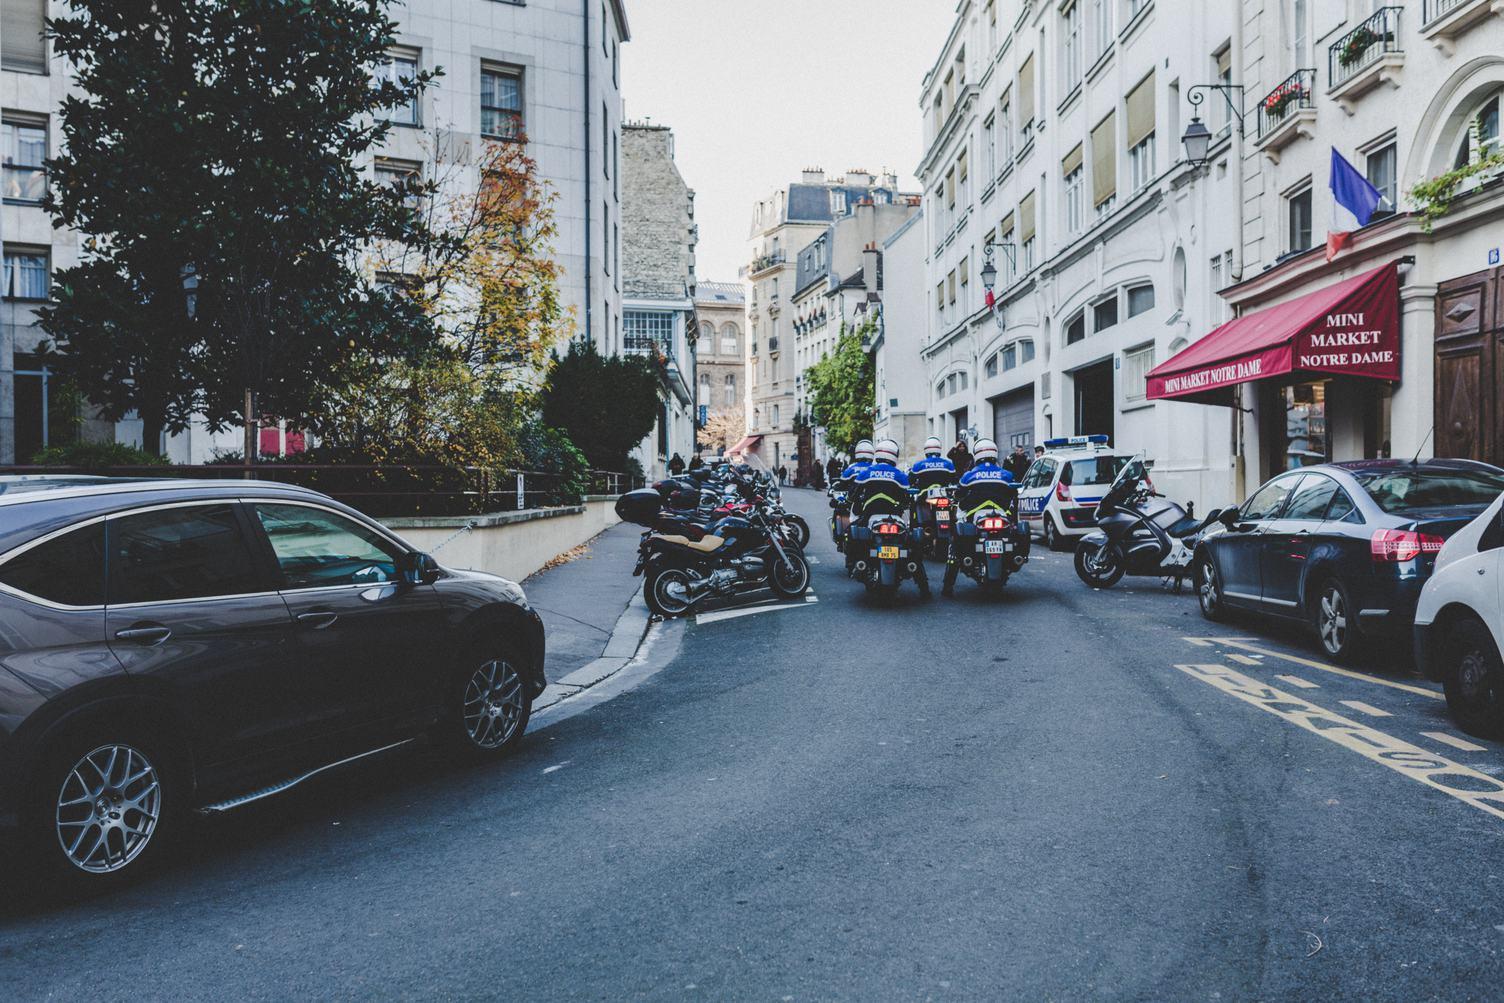 Group of Policemen on Bikes